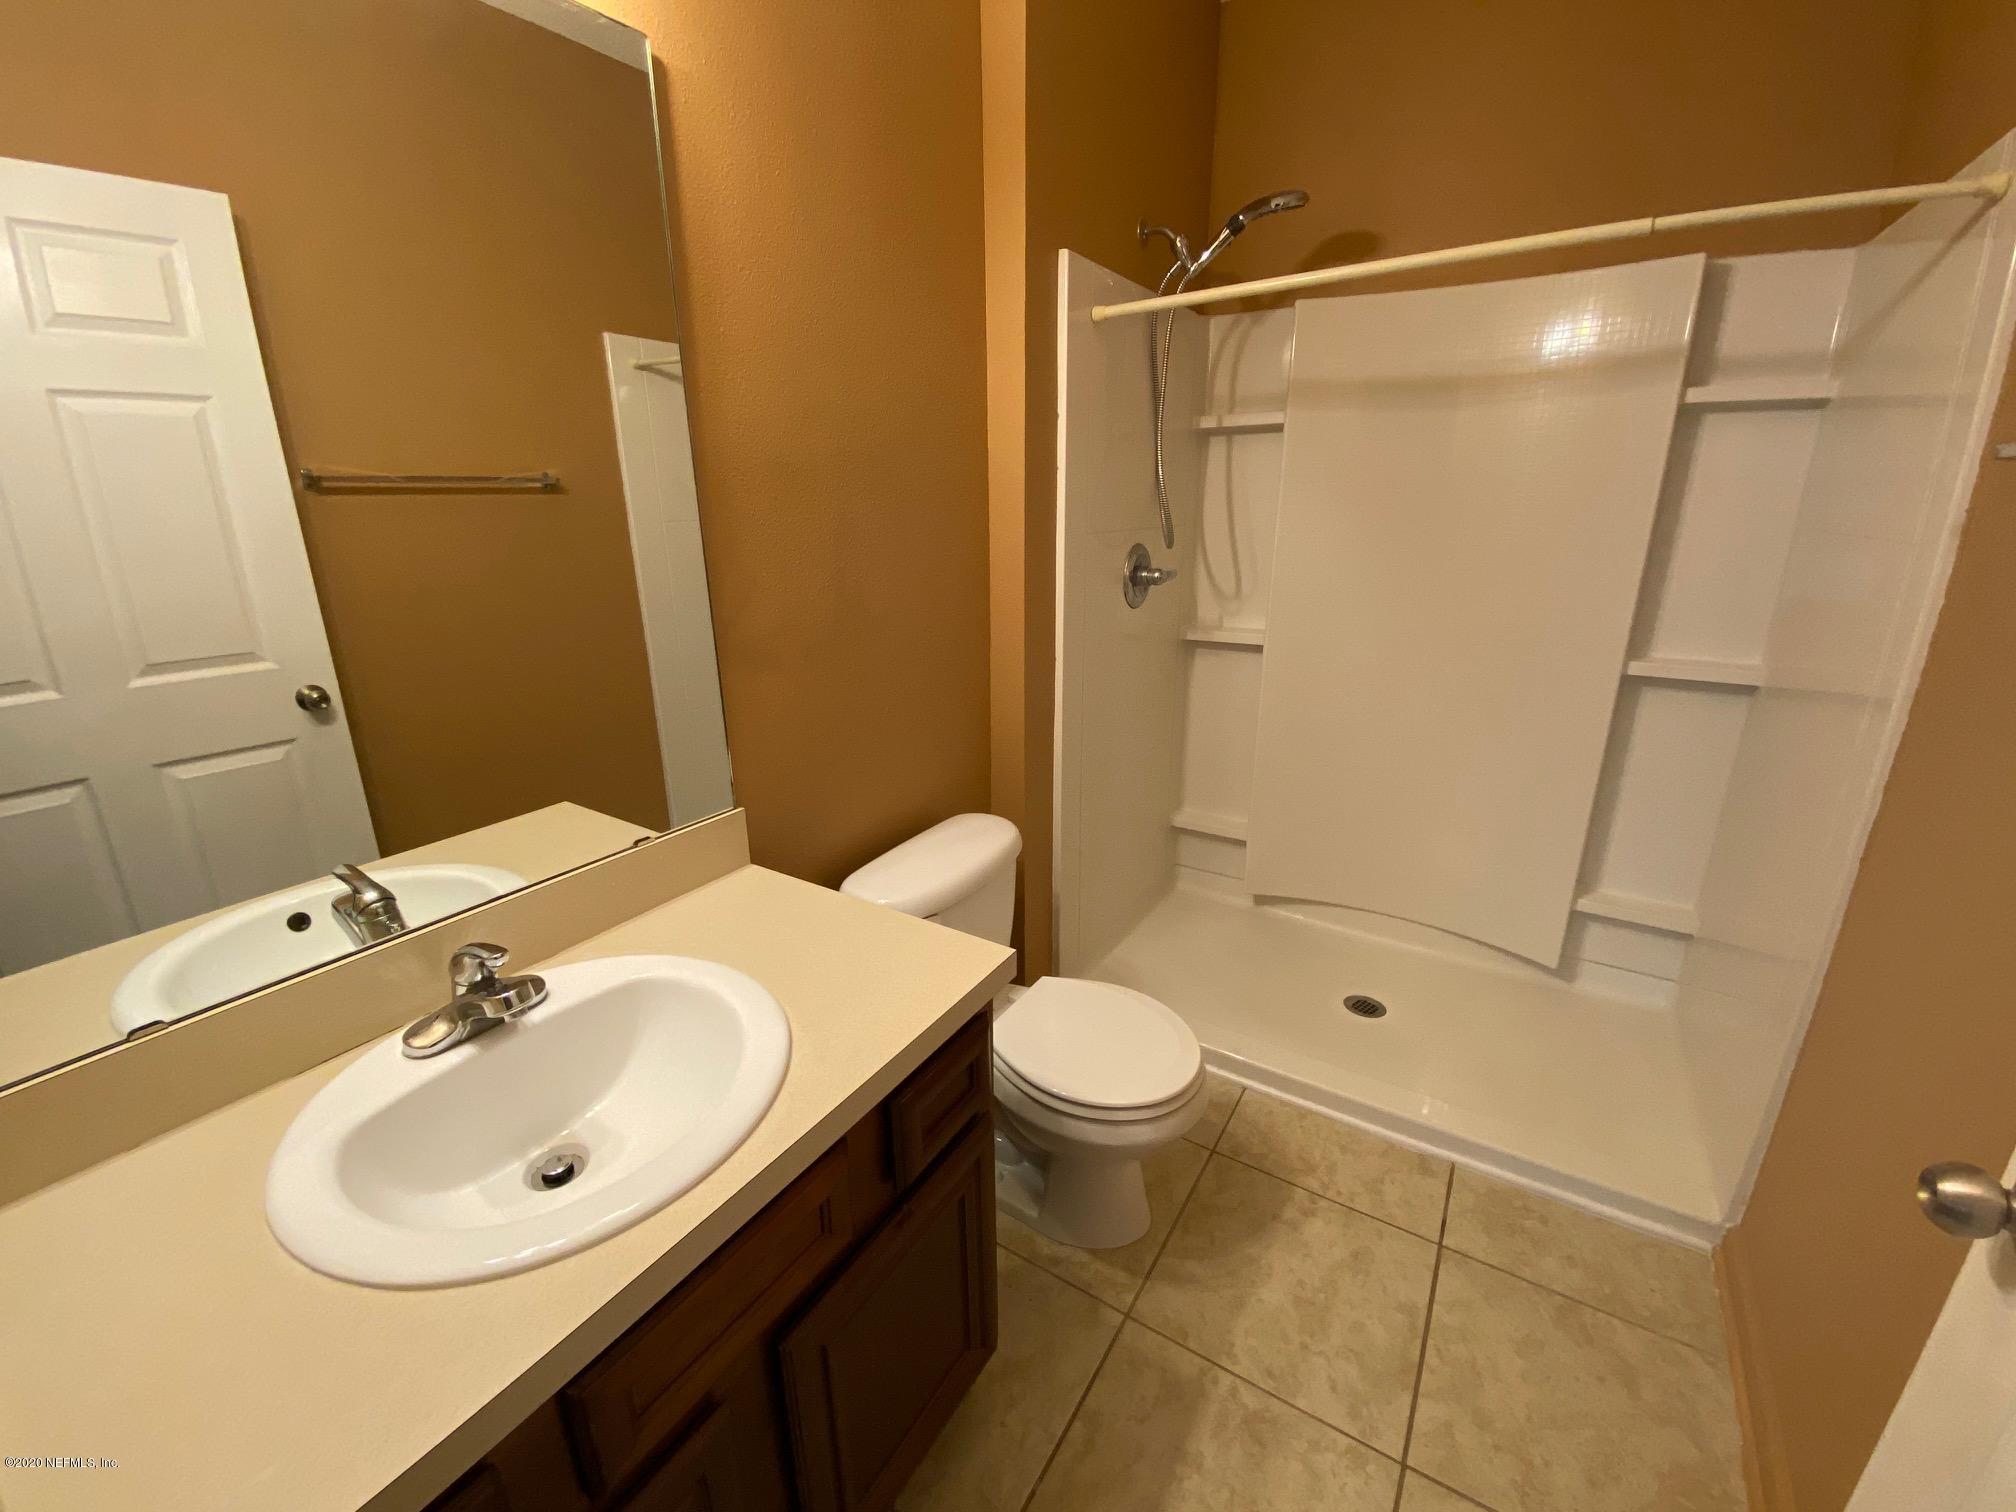 4998 KEY LIME, JACKSONVILLE, FLORIDA 32256, 3 Bedrooms Bedrooms, ,2 BathroomsBathrooms,Rental,For Rent,KEY LIME,1082740